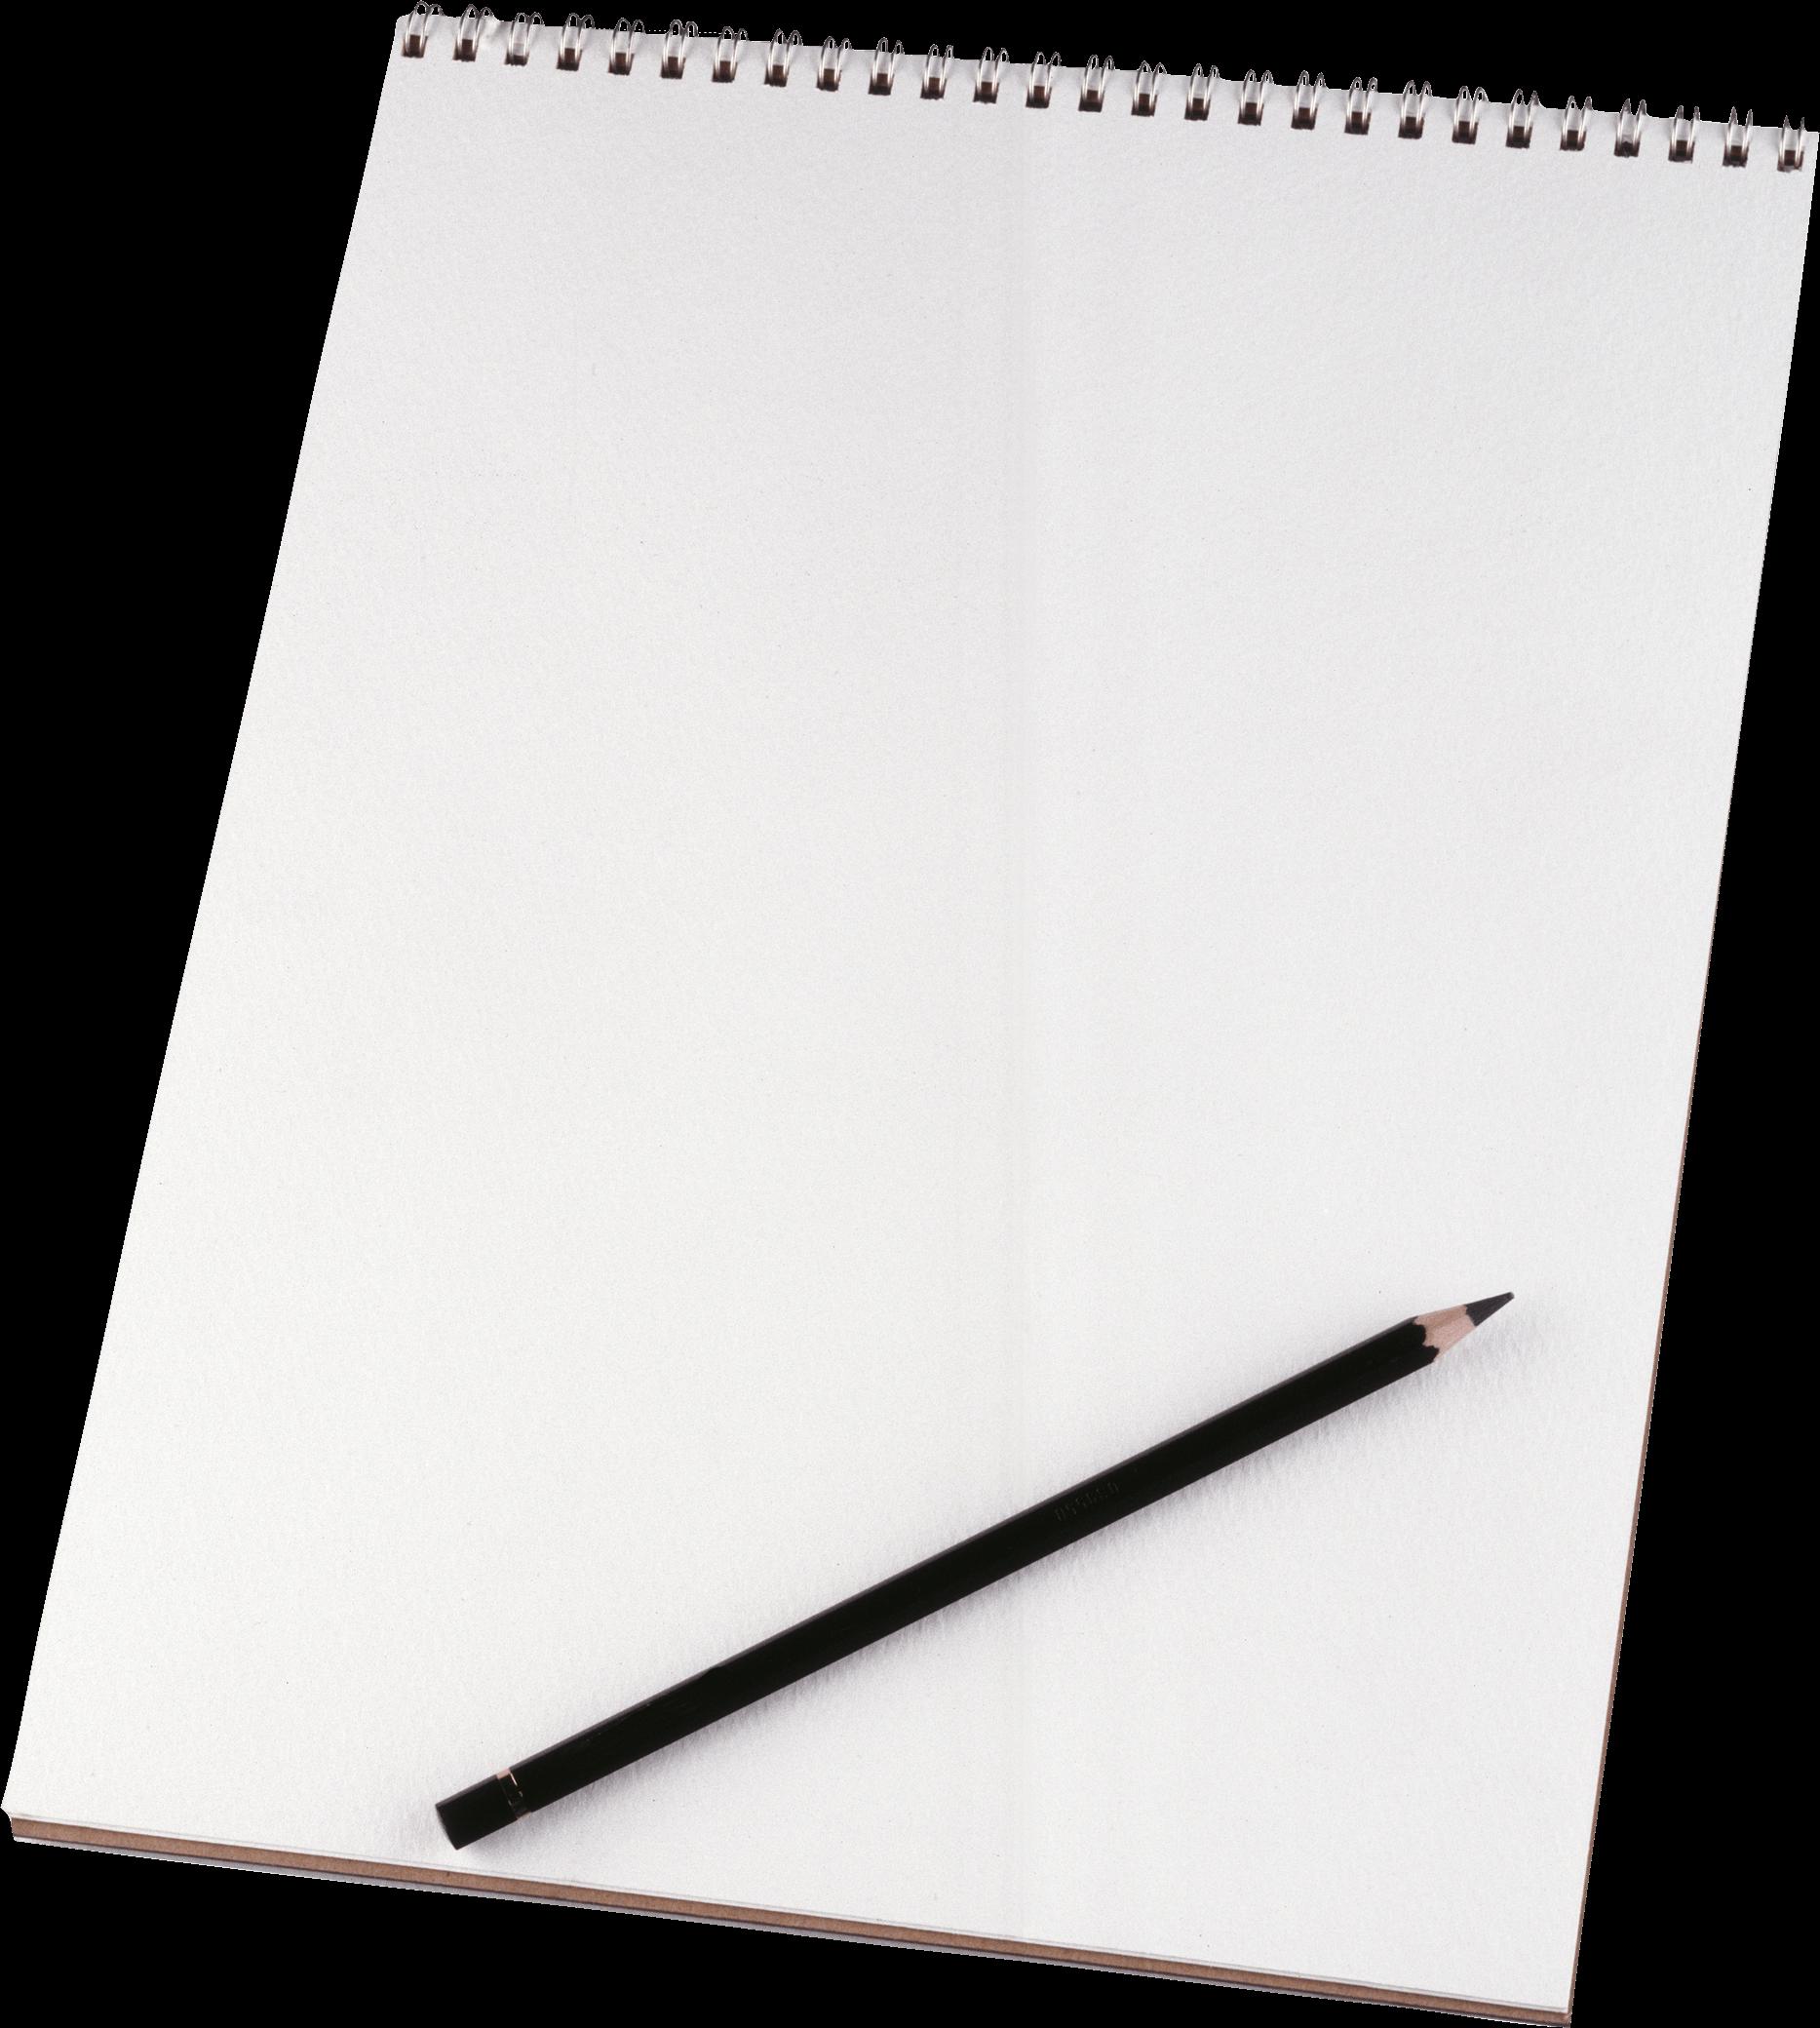 Notebook clipart notebook sheet. Paper pencil transparent png